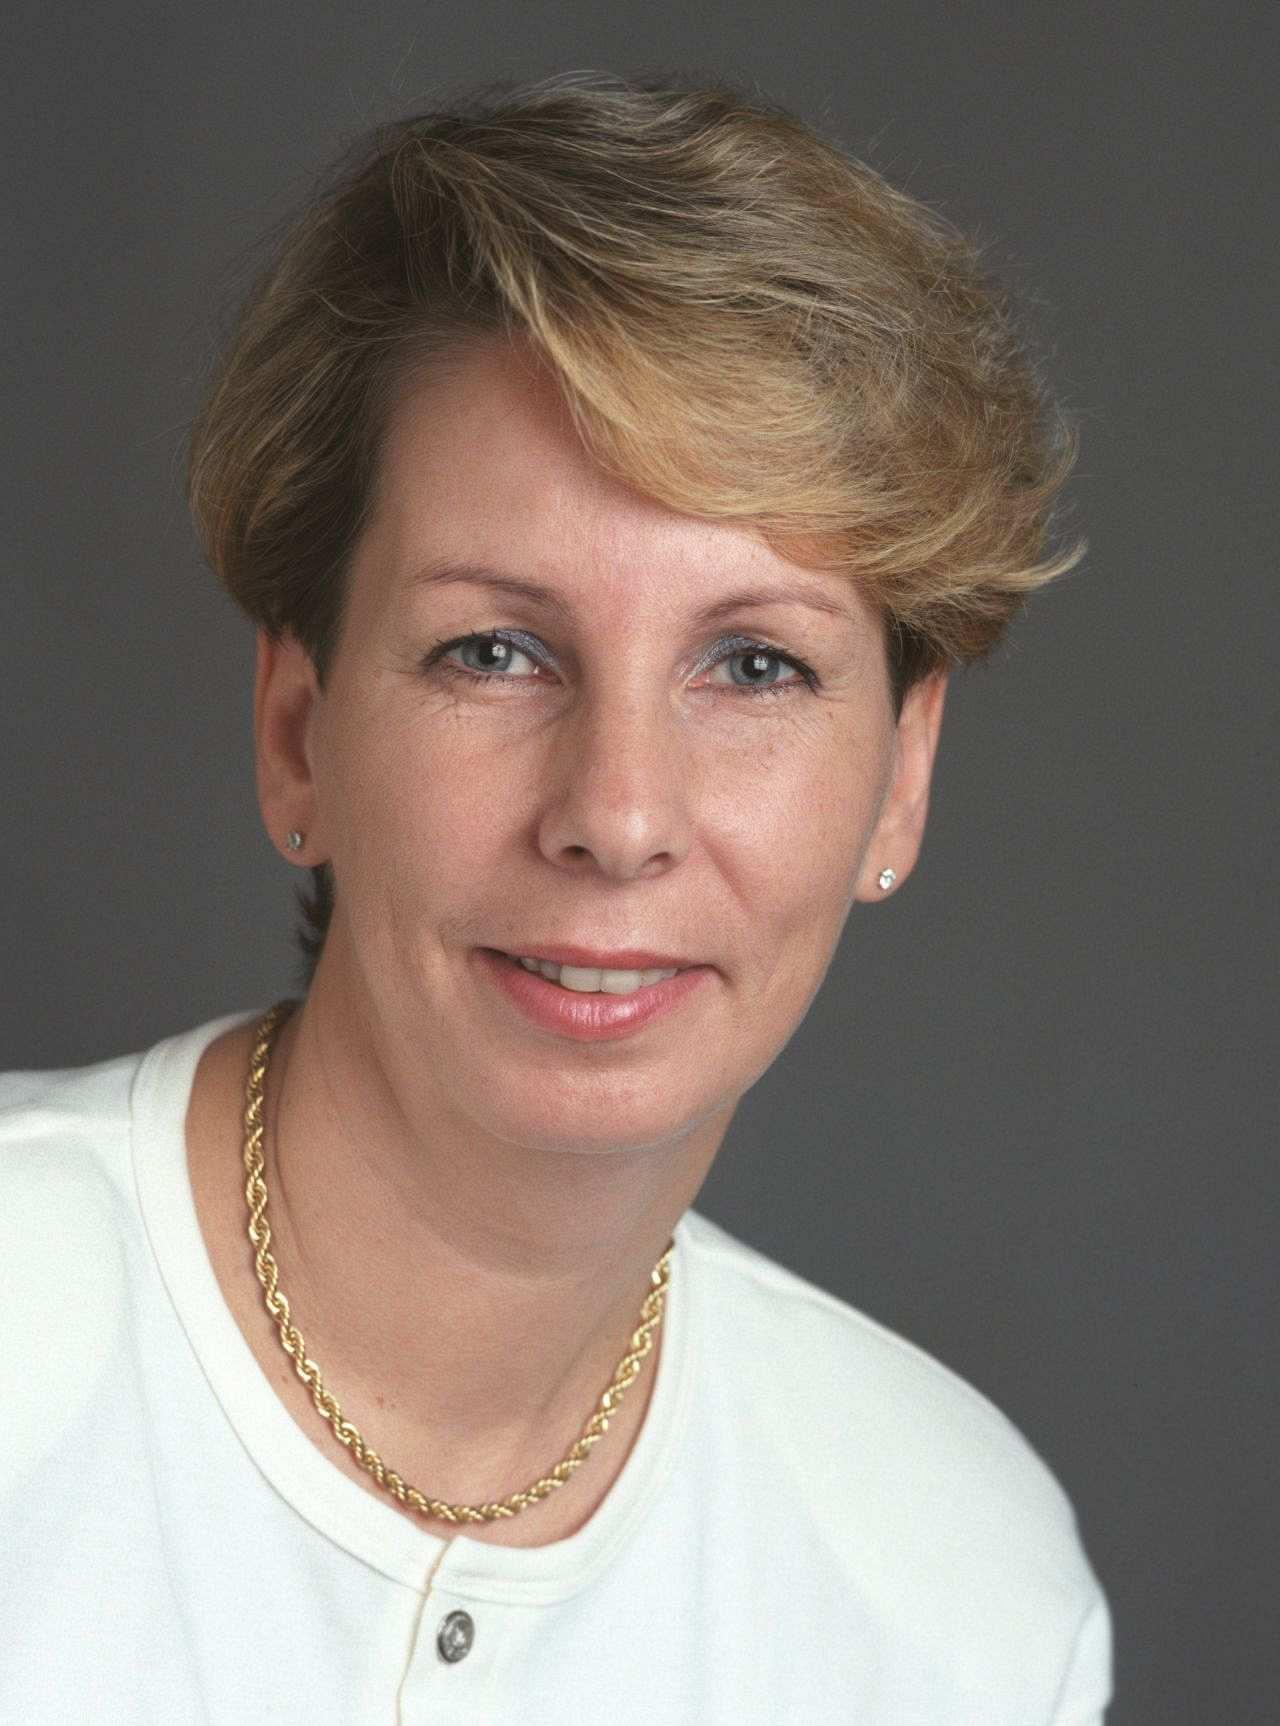 Hannelore Kraft 1961 Sabine Leutheusser Schnarrenberger Director